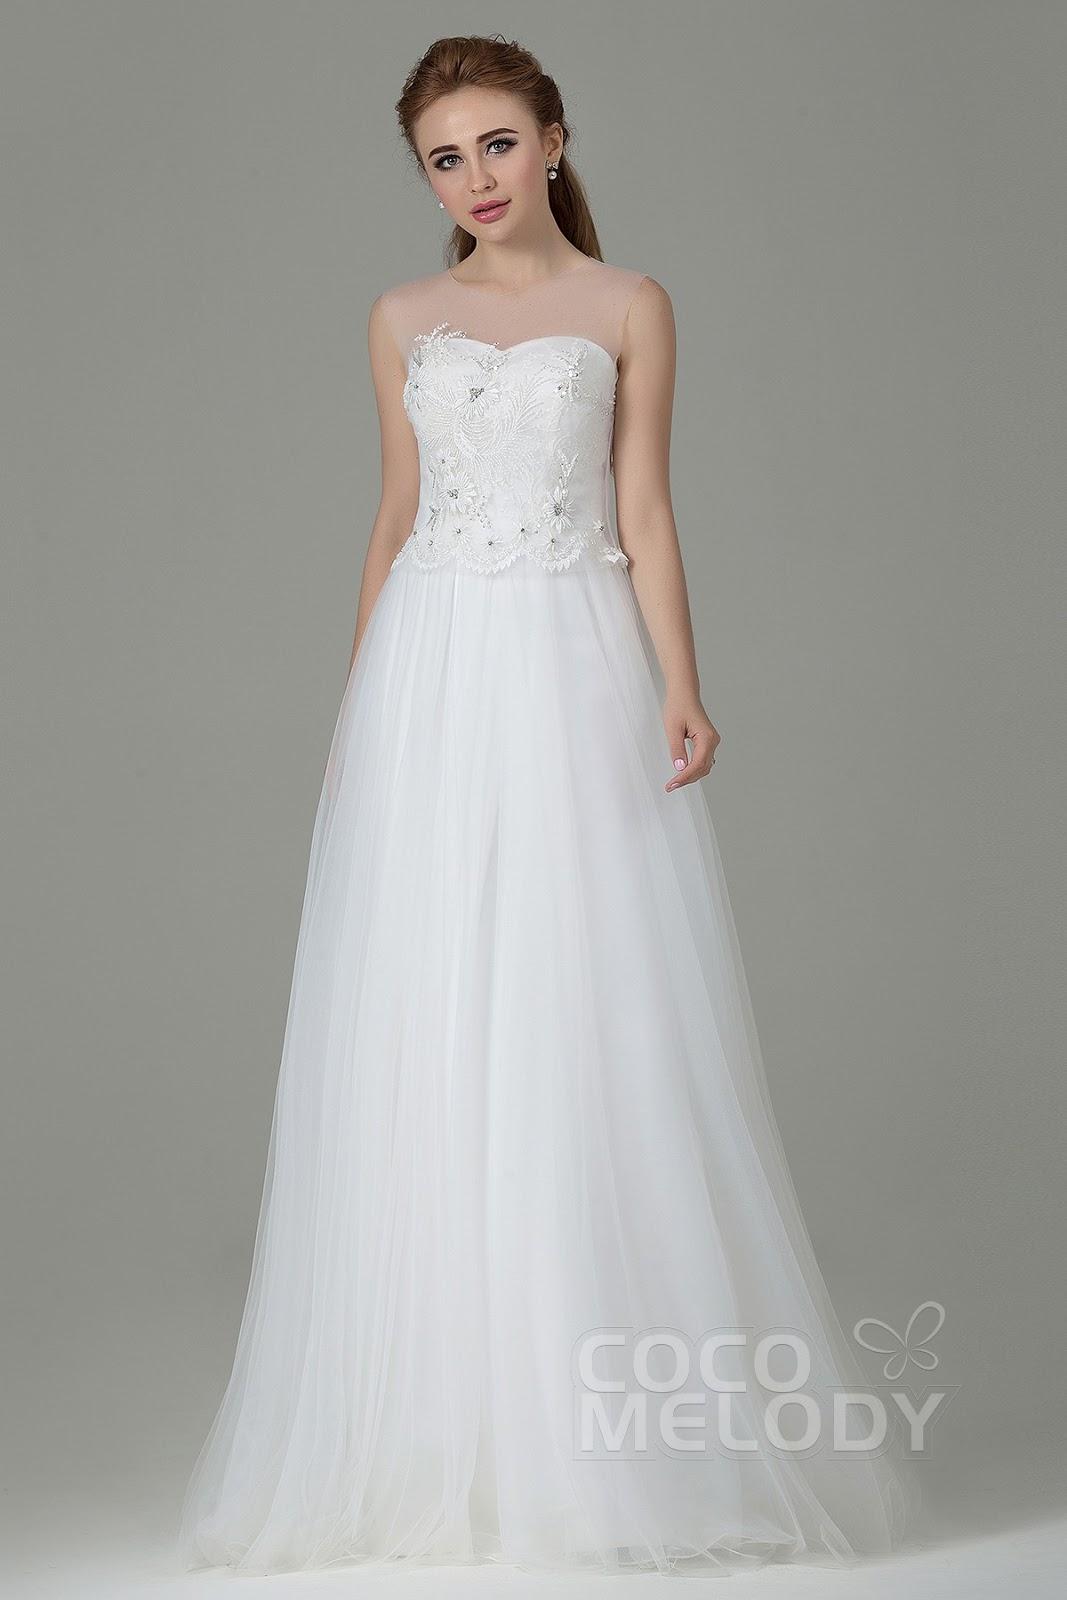 EveryMom\'sPage: Best Wedding Dresses 2016